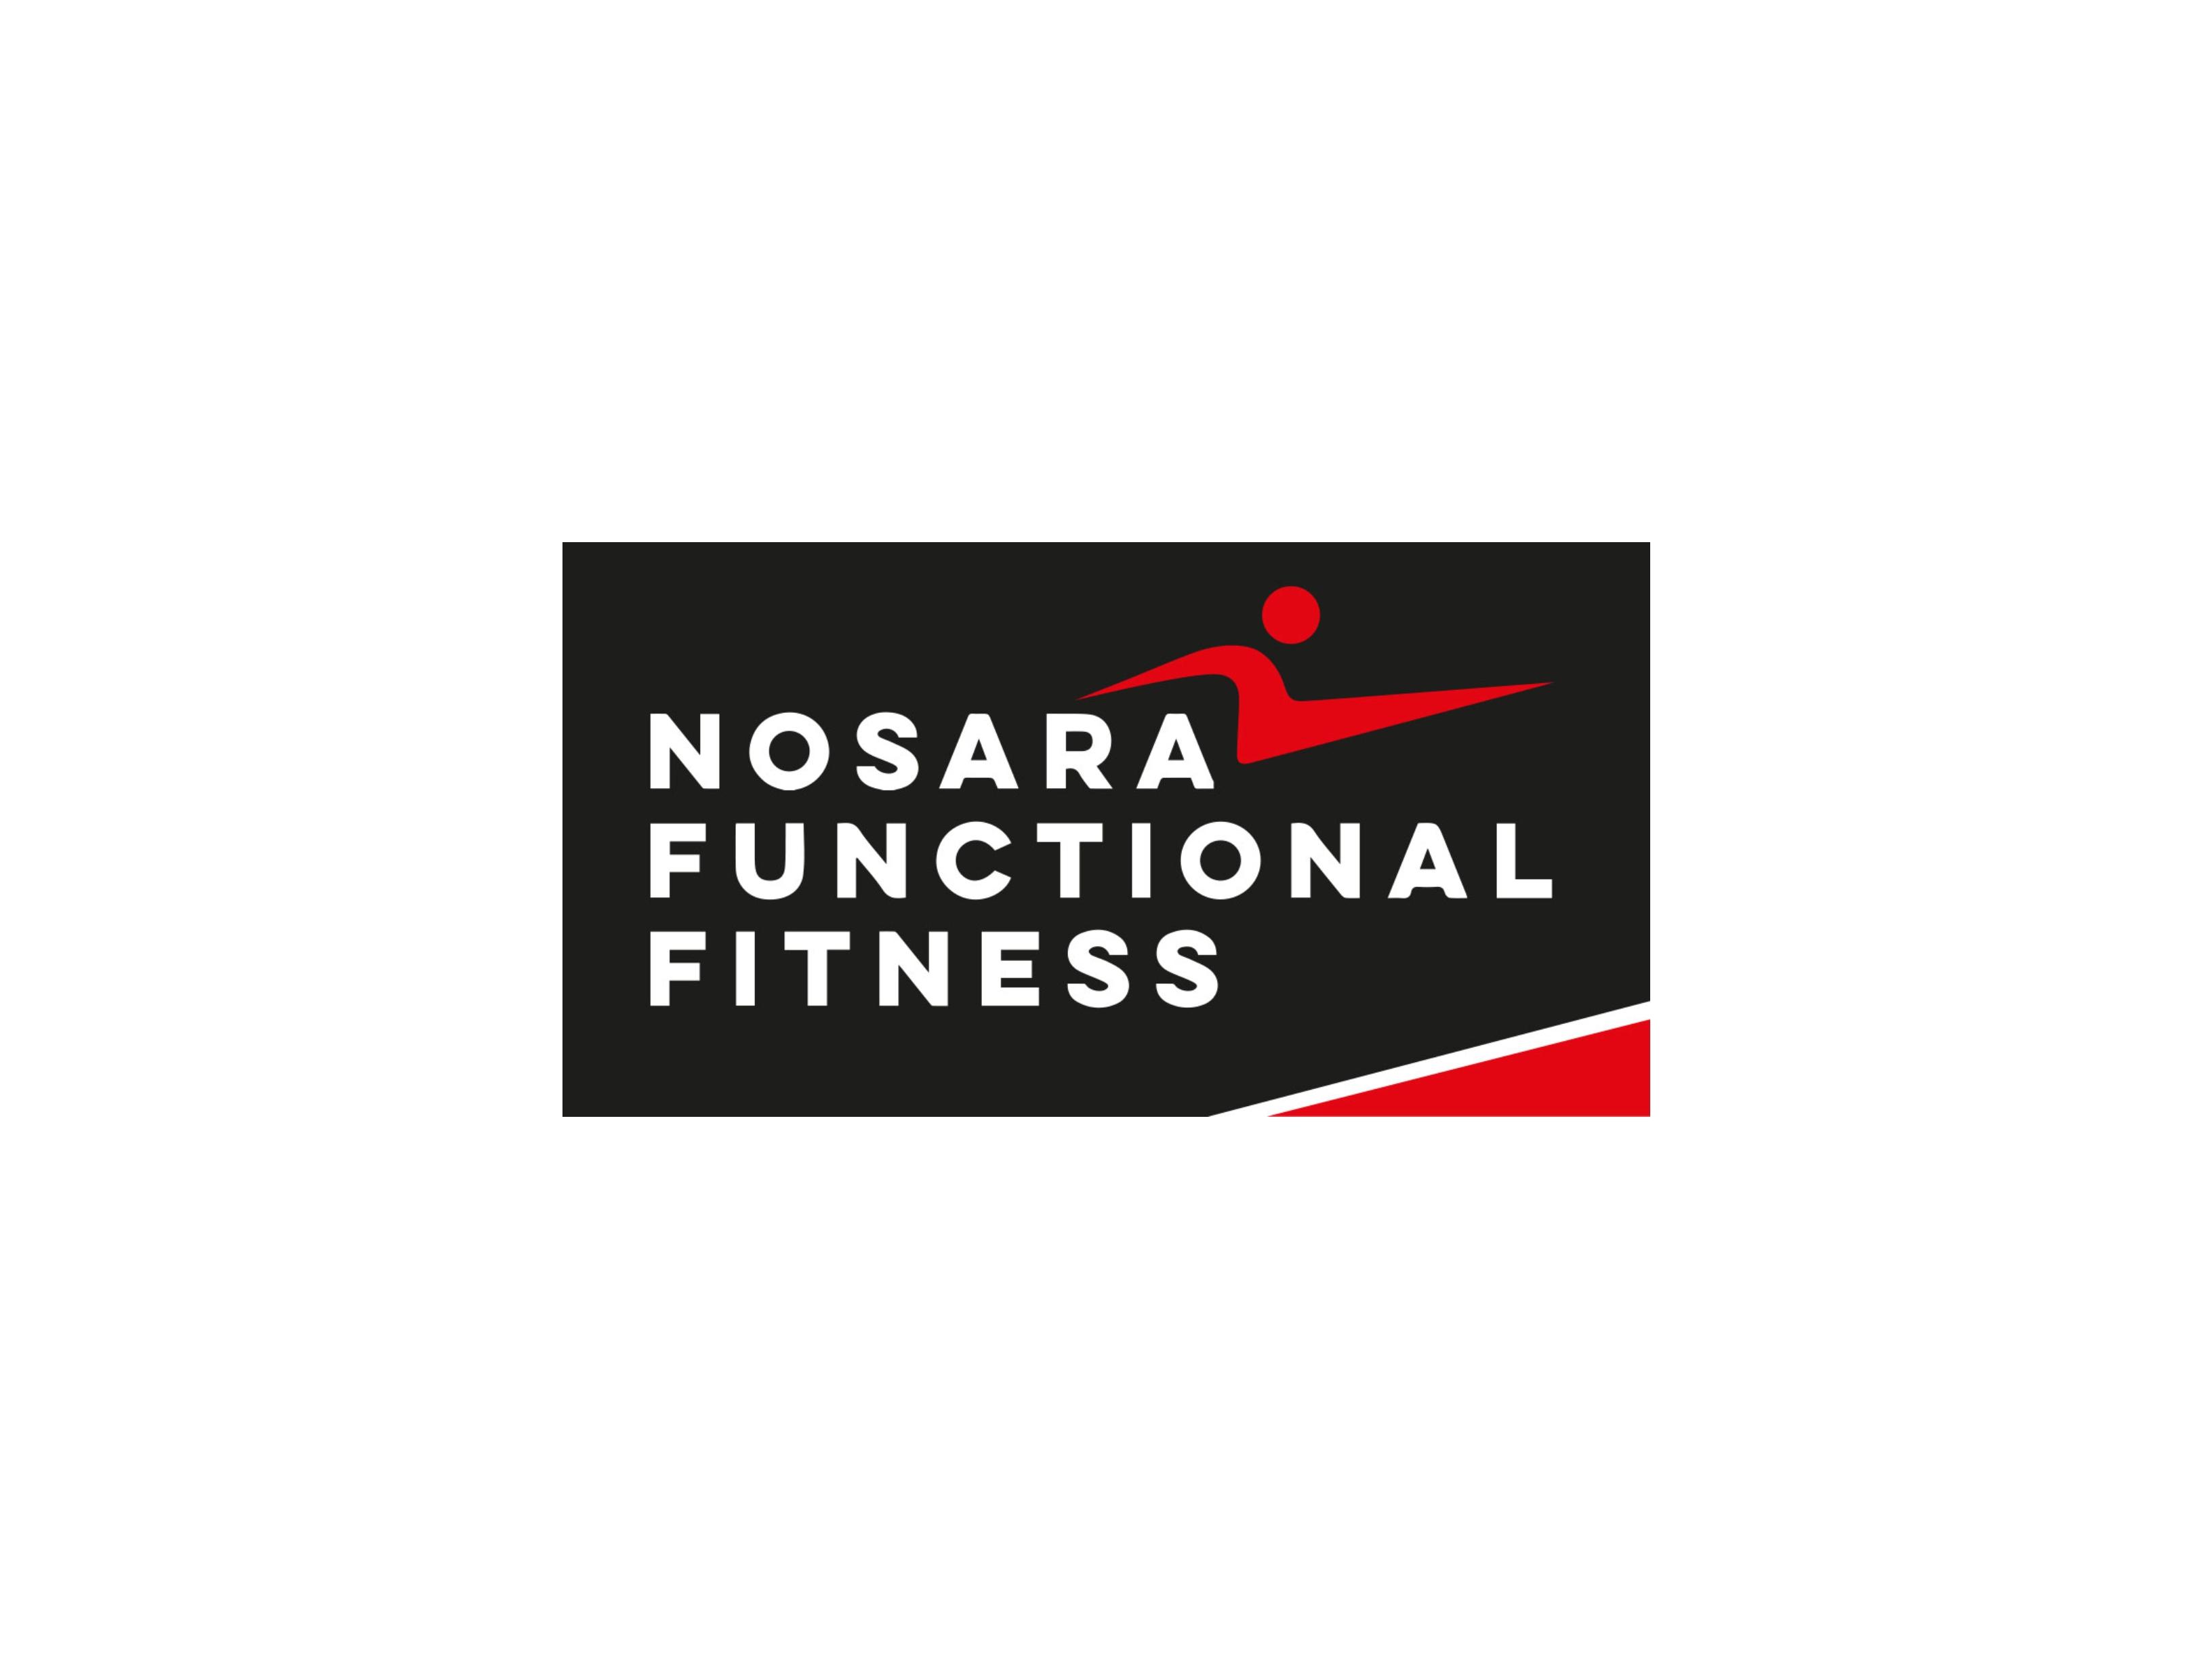 Nosara Fuctional Fitness